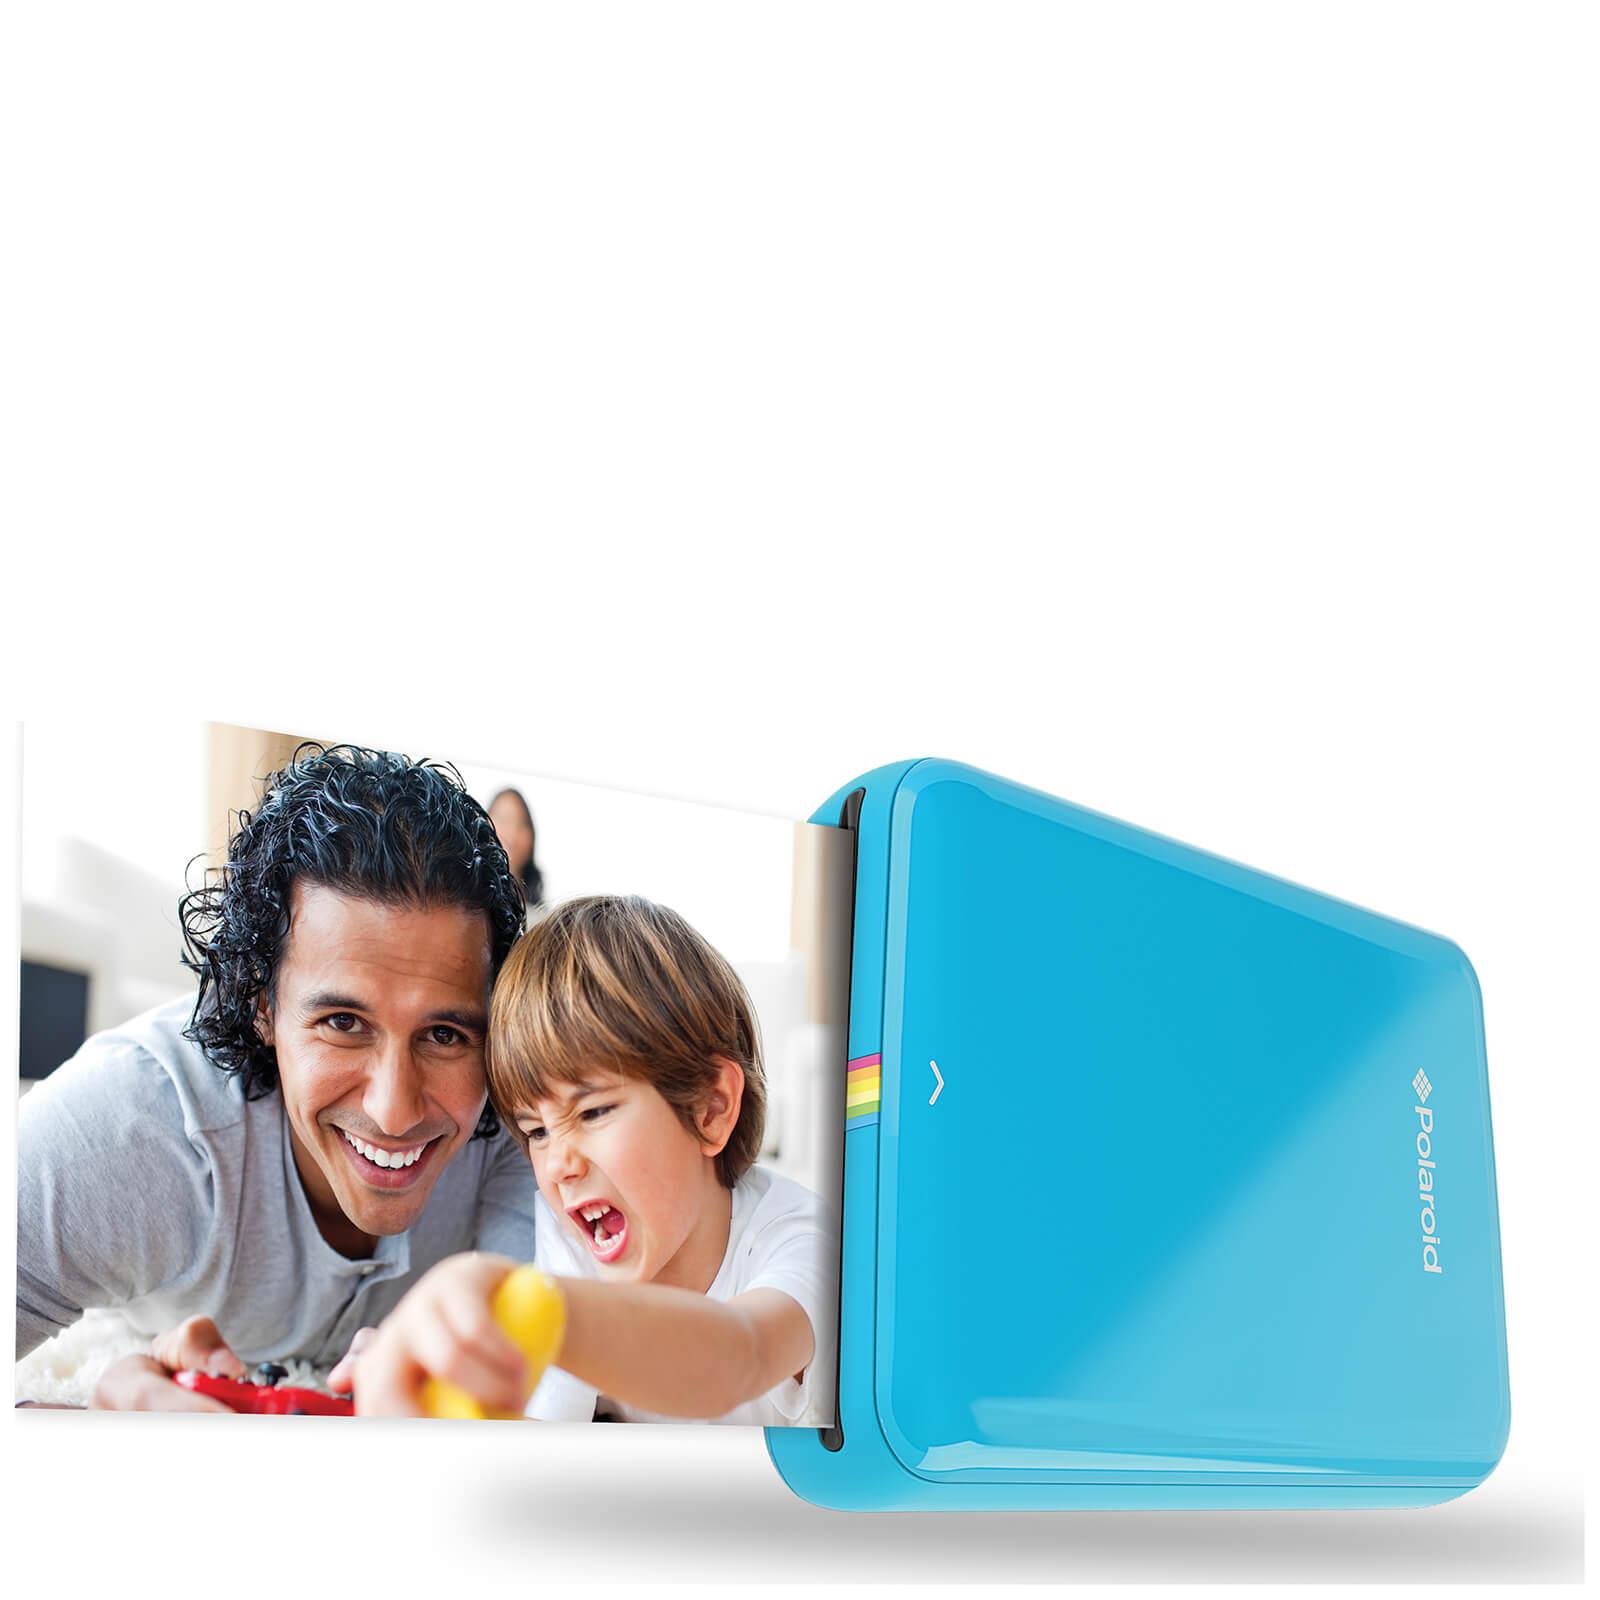 Polaroid Zip Bluetooth Instant Mobile Printer - Blue